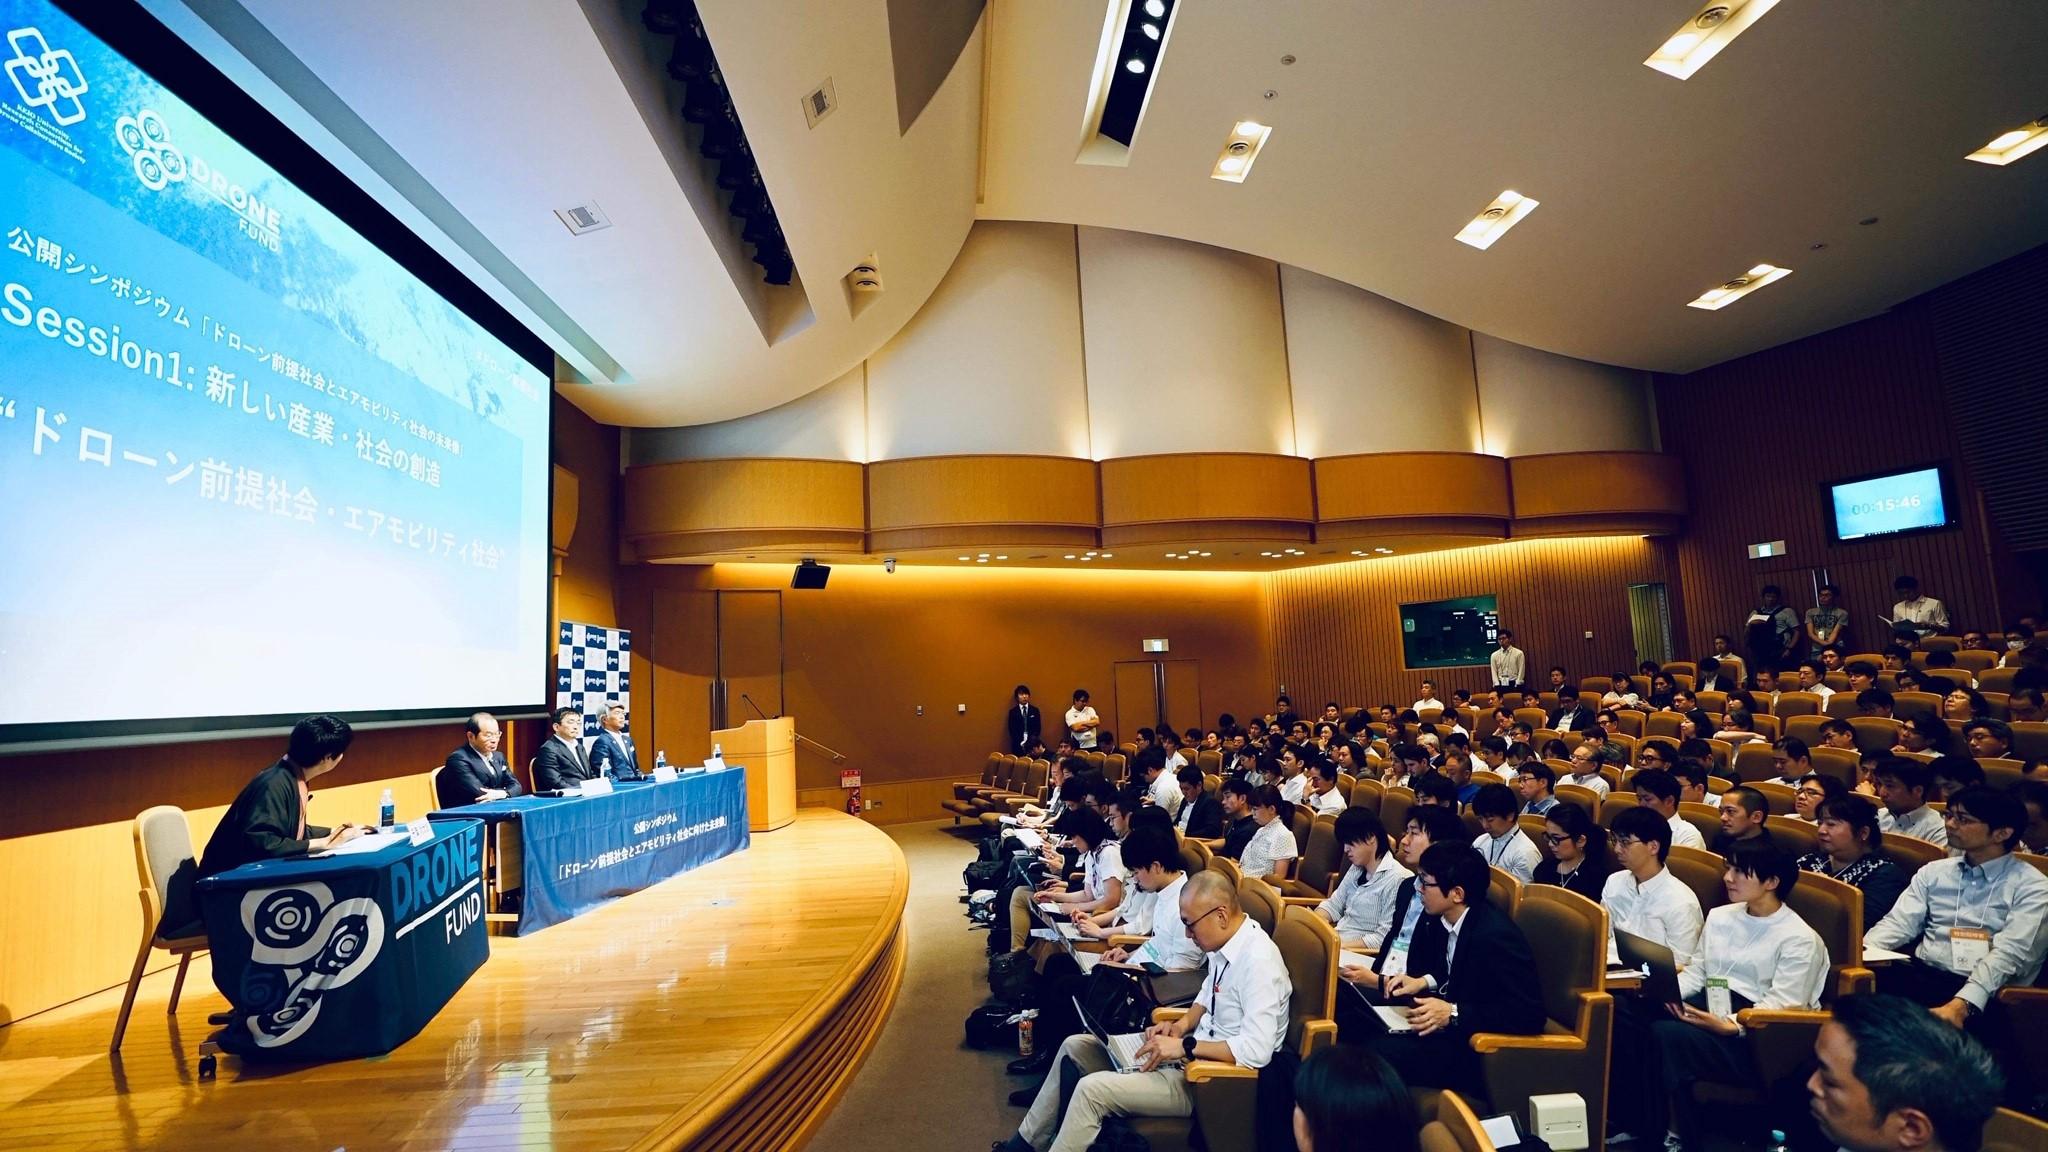 Drone Fundと慶應ドロコンが公開シンポジウム みずほ頭取、KDDI社長も登壇 千葉功太郎氏「日本に新しい産業を」